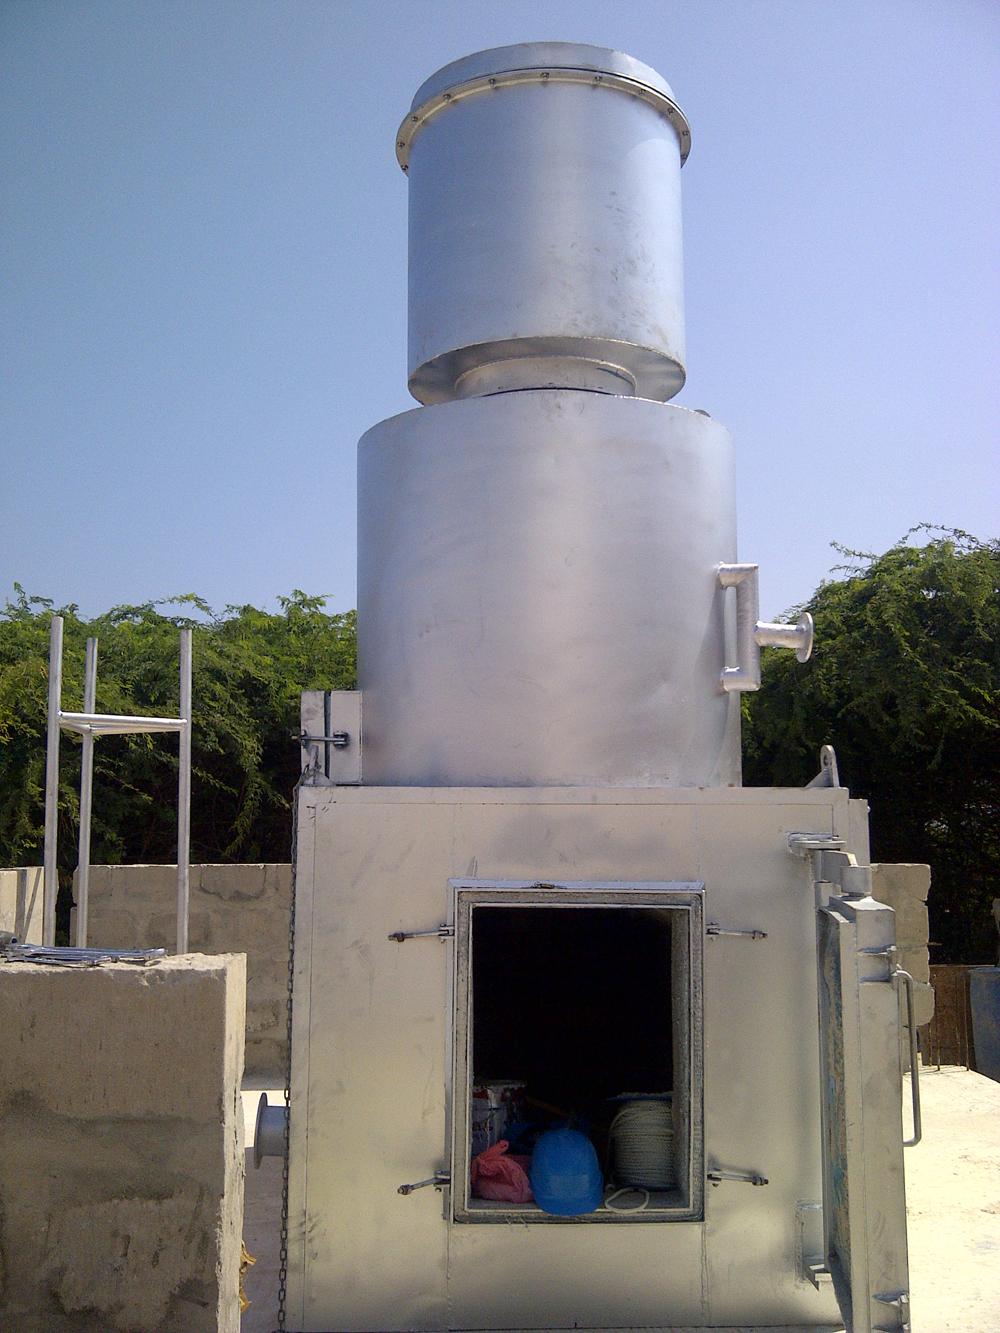 300 kg incinerator